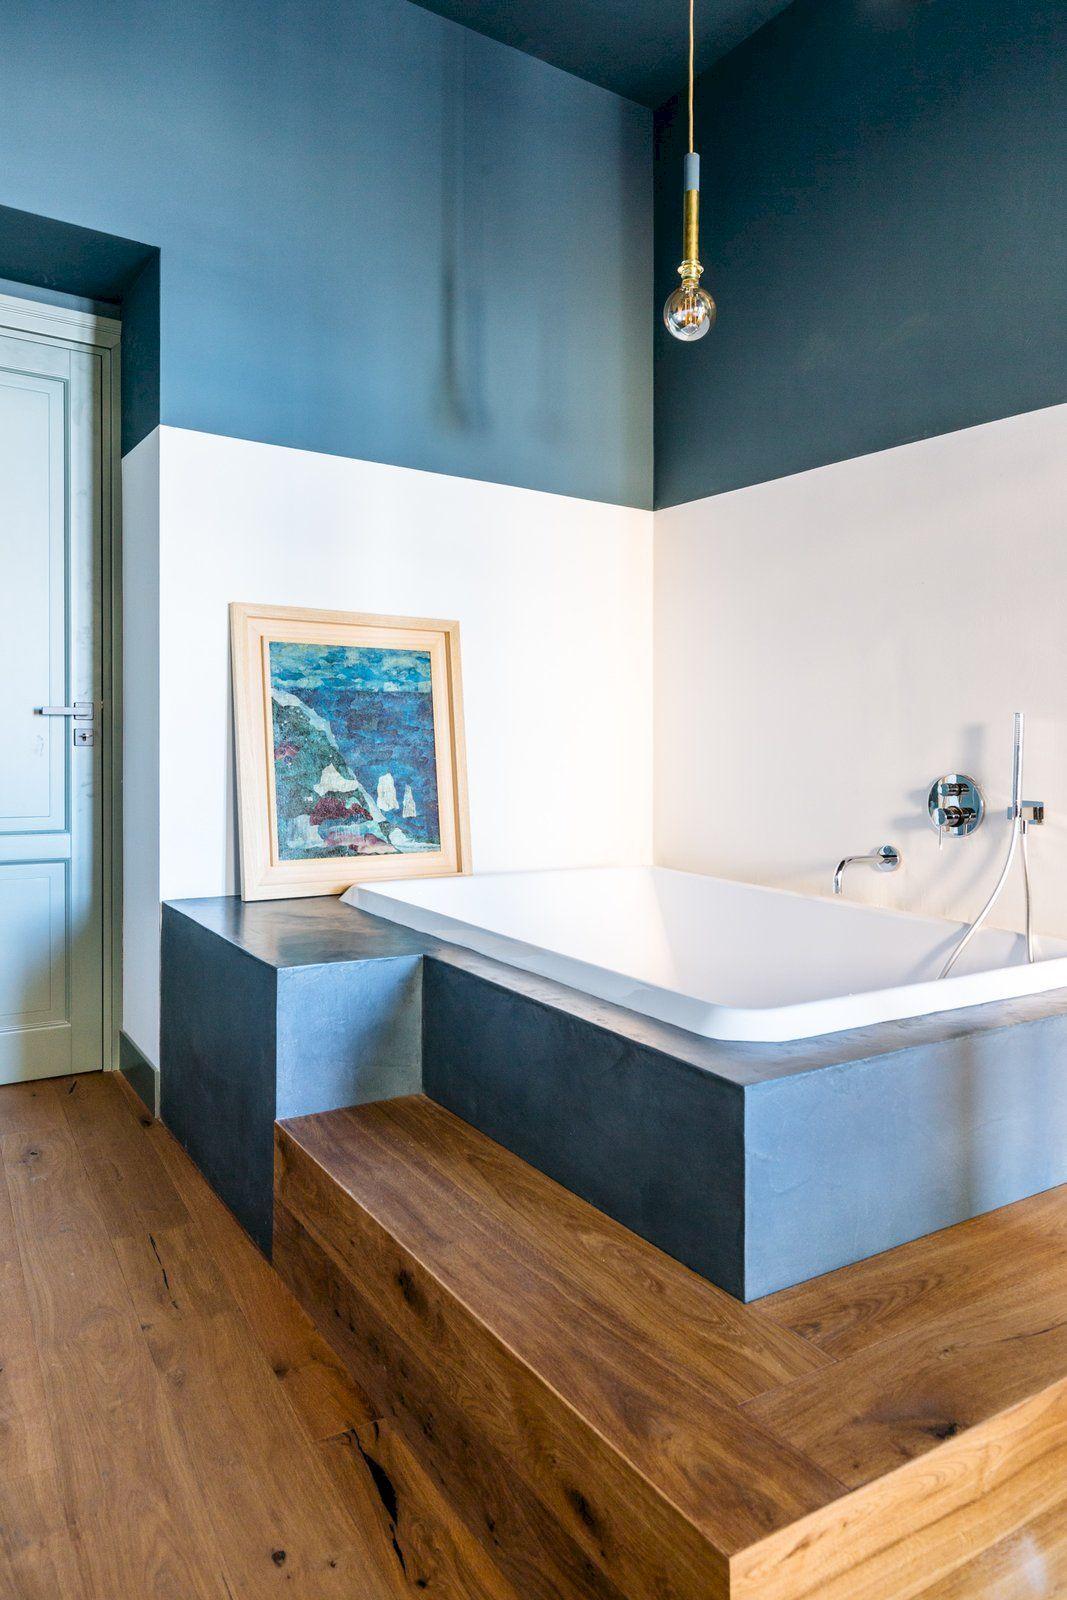 46 pretty blue bathroom designs ideas you can try best